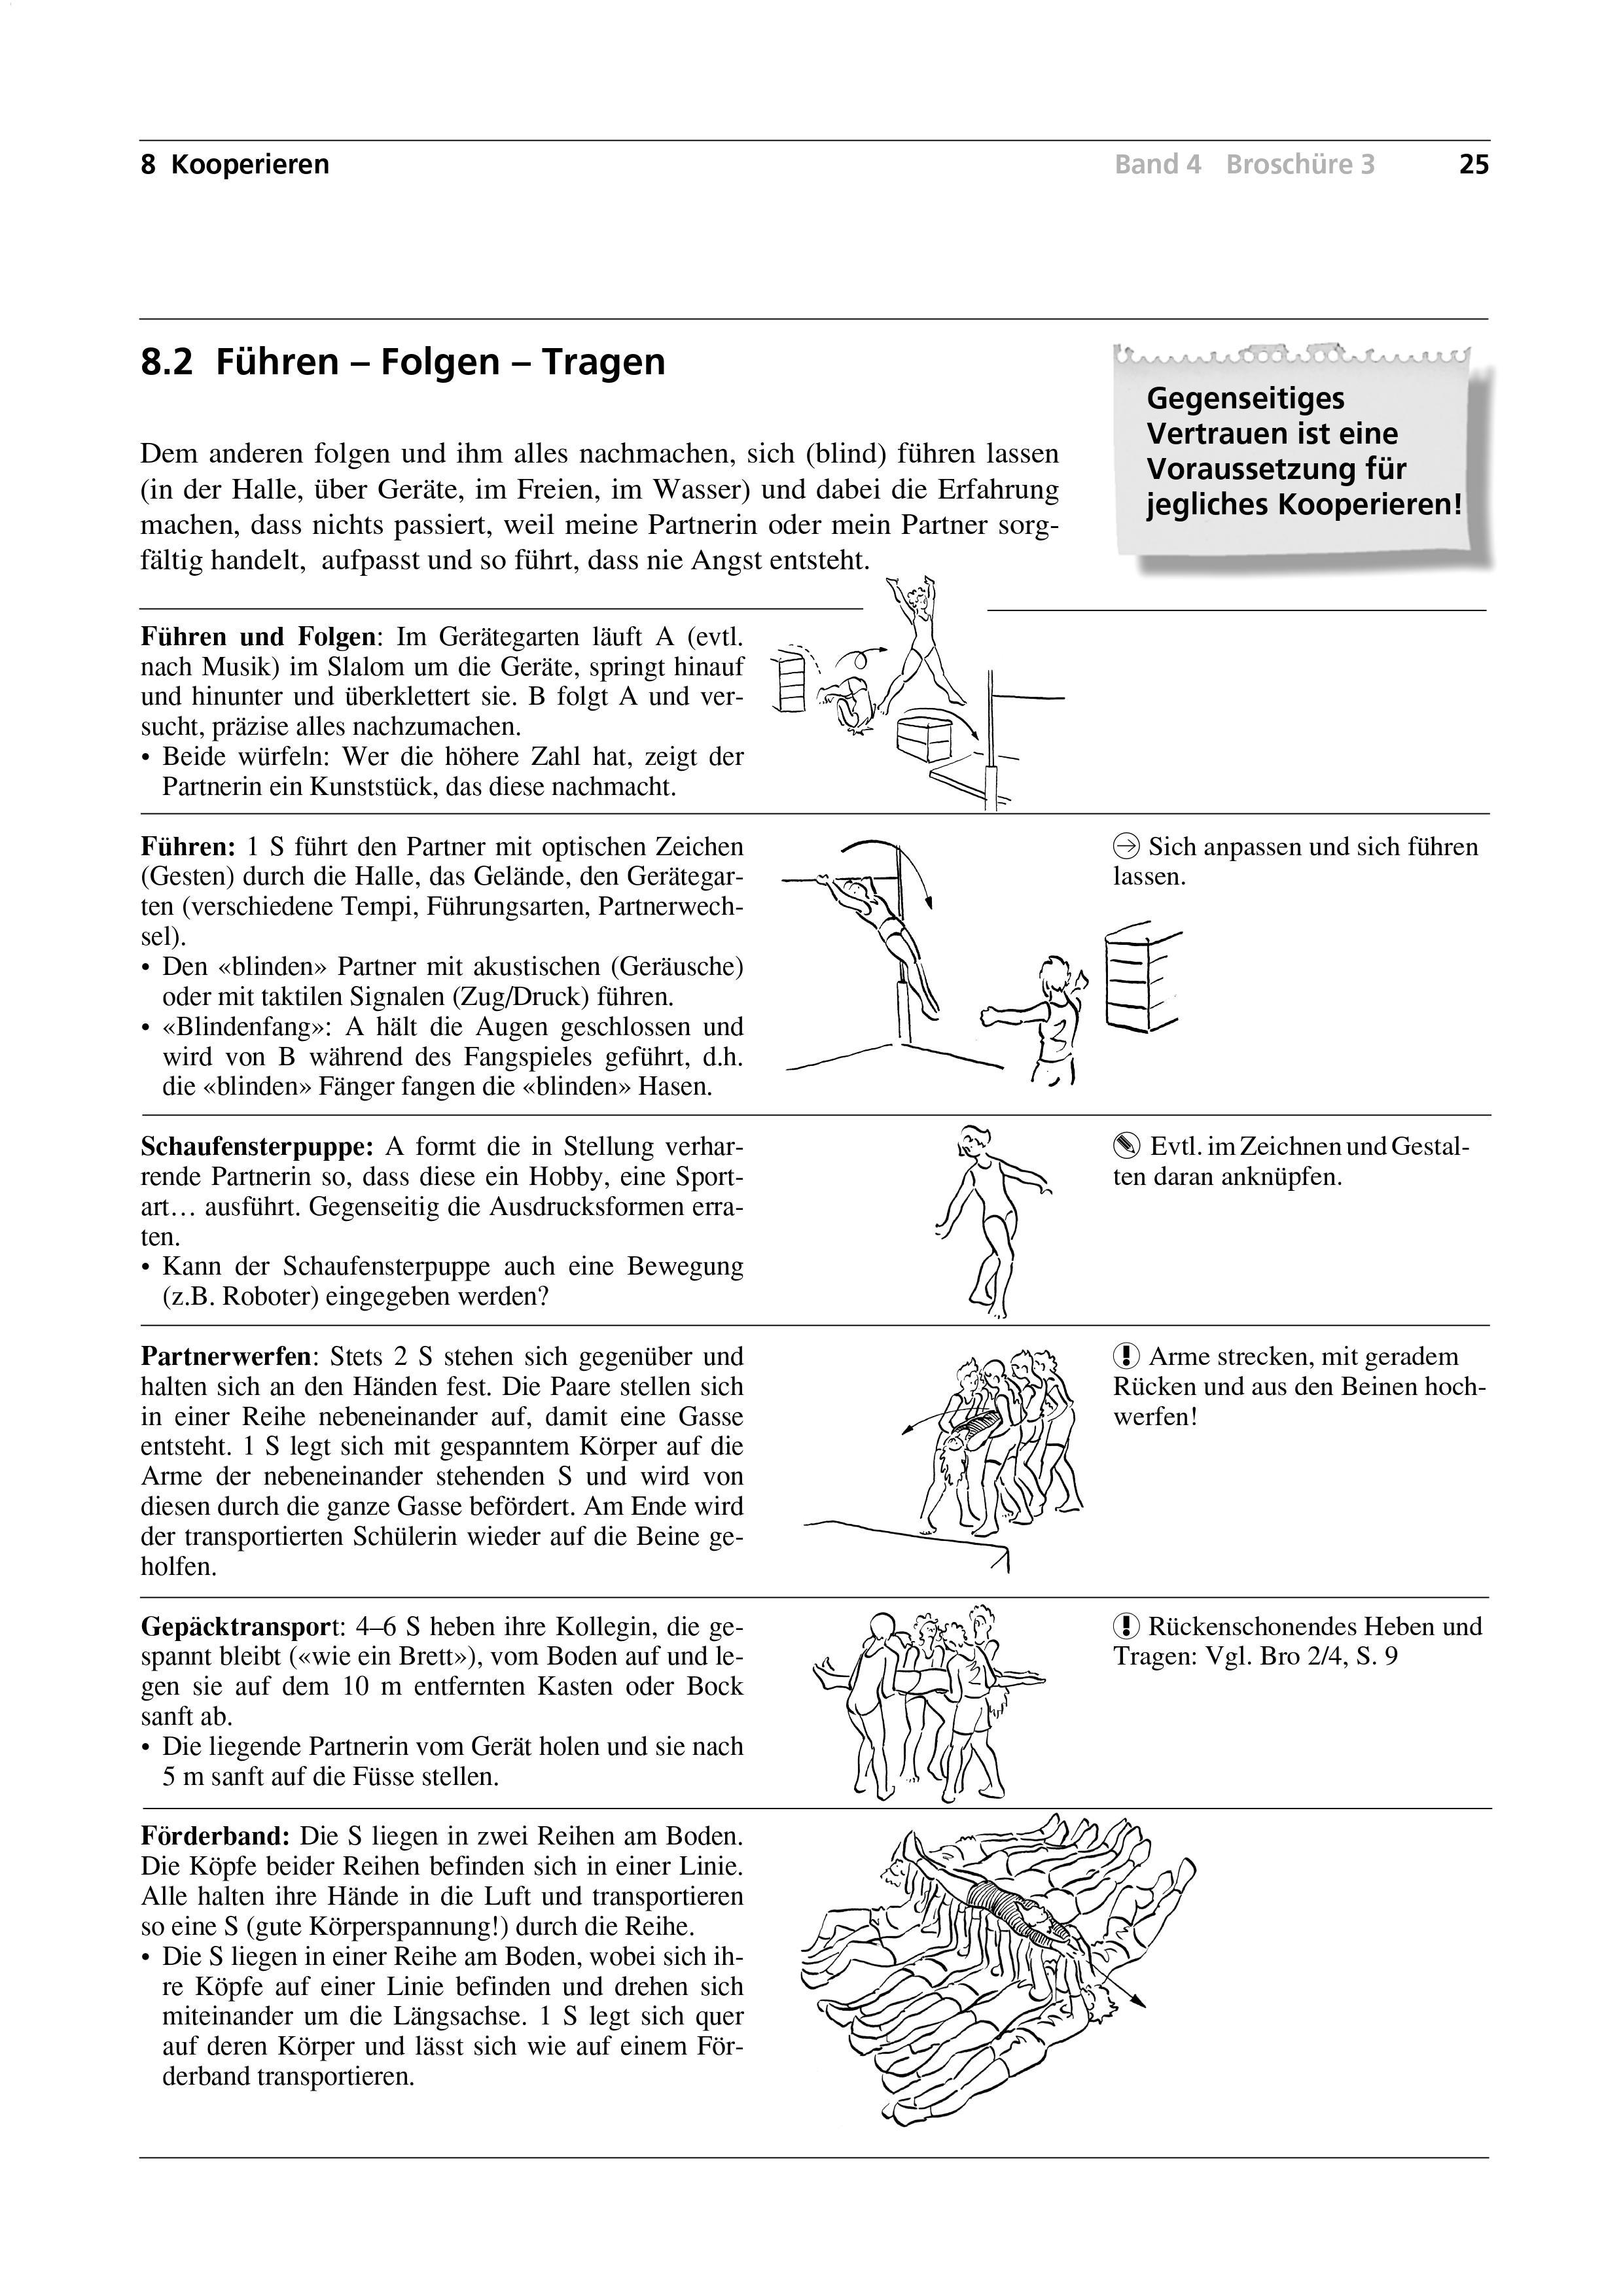 Preview image for LOM object Führen-Folgen-Tragen